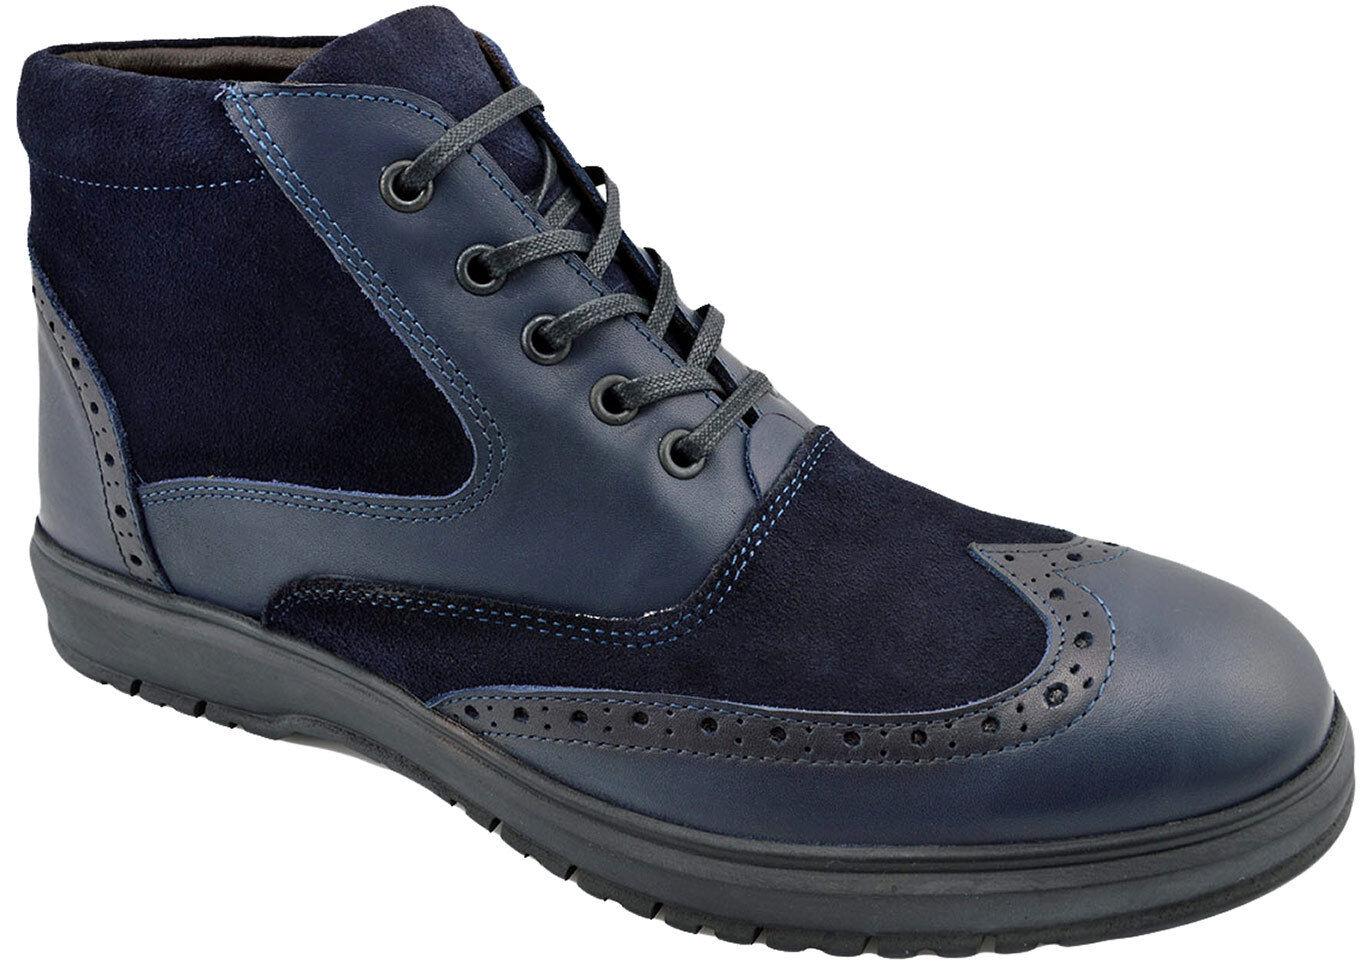 200 REACTOR Blau Leather Suede WINGTIP Brogue Ankle Stiefel Men schuhe